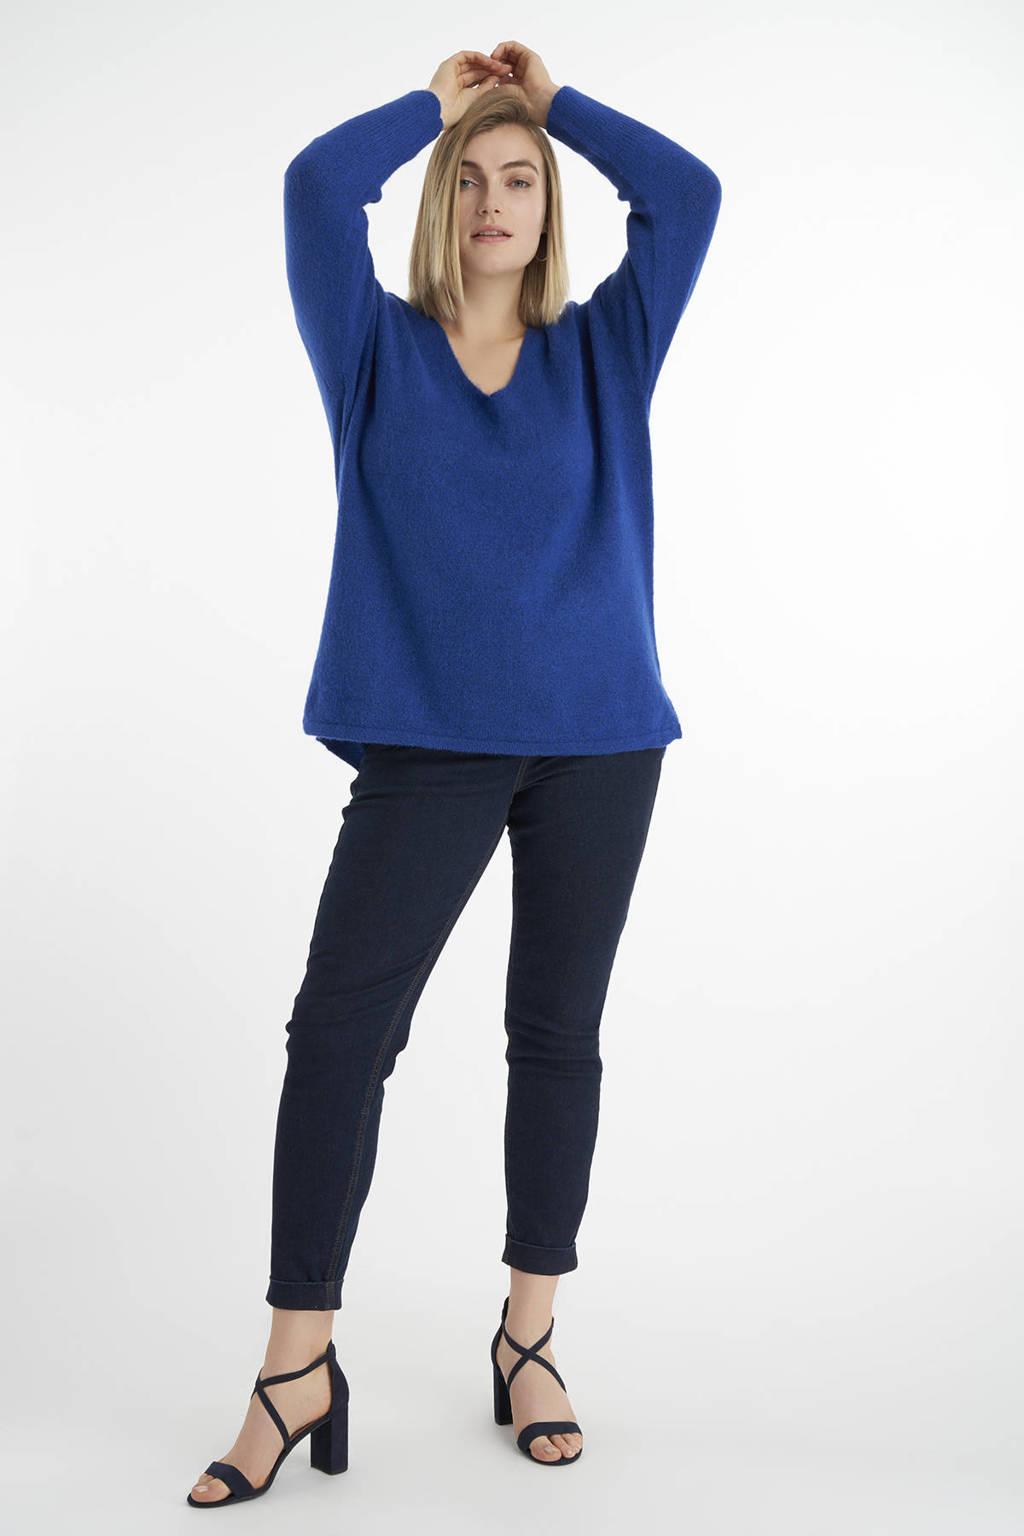 MS Mode gemêleerde trui blauw, Blauw